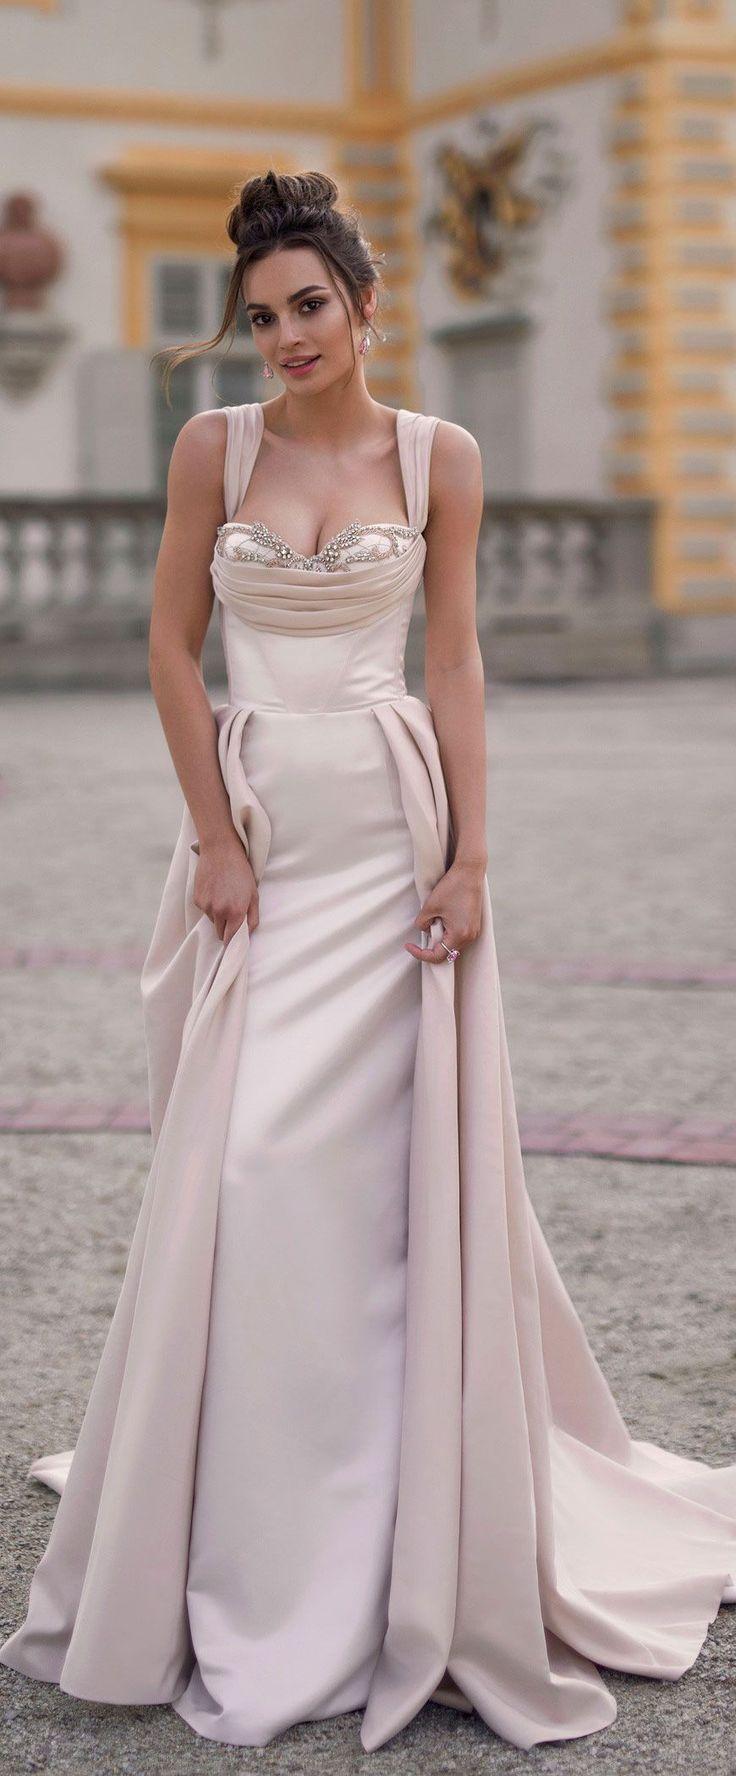 Sleeveless sweetheart neckline column dress Blammo Biamo 2018